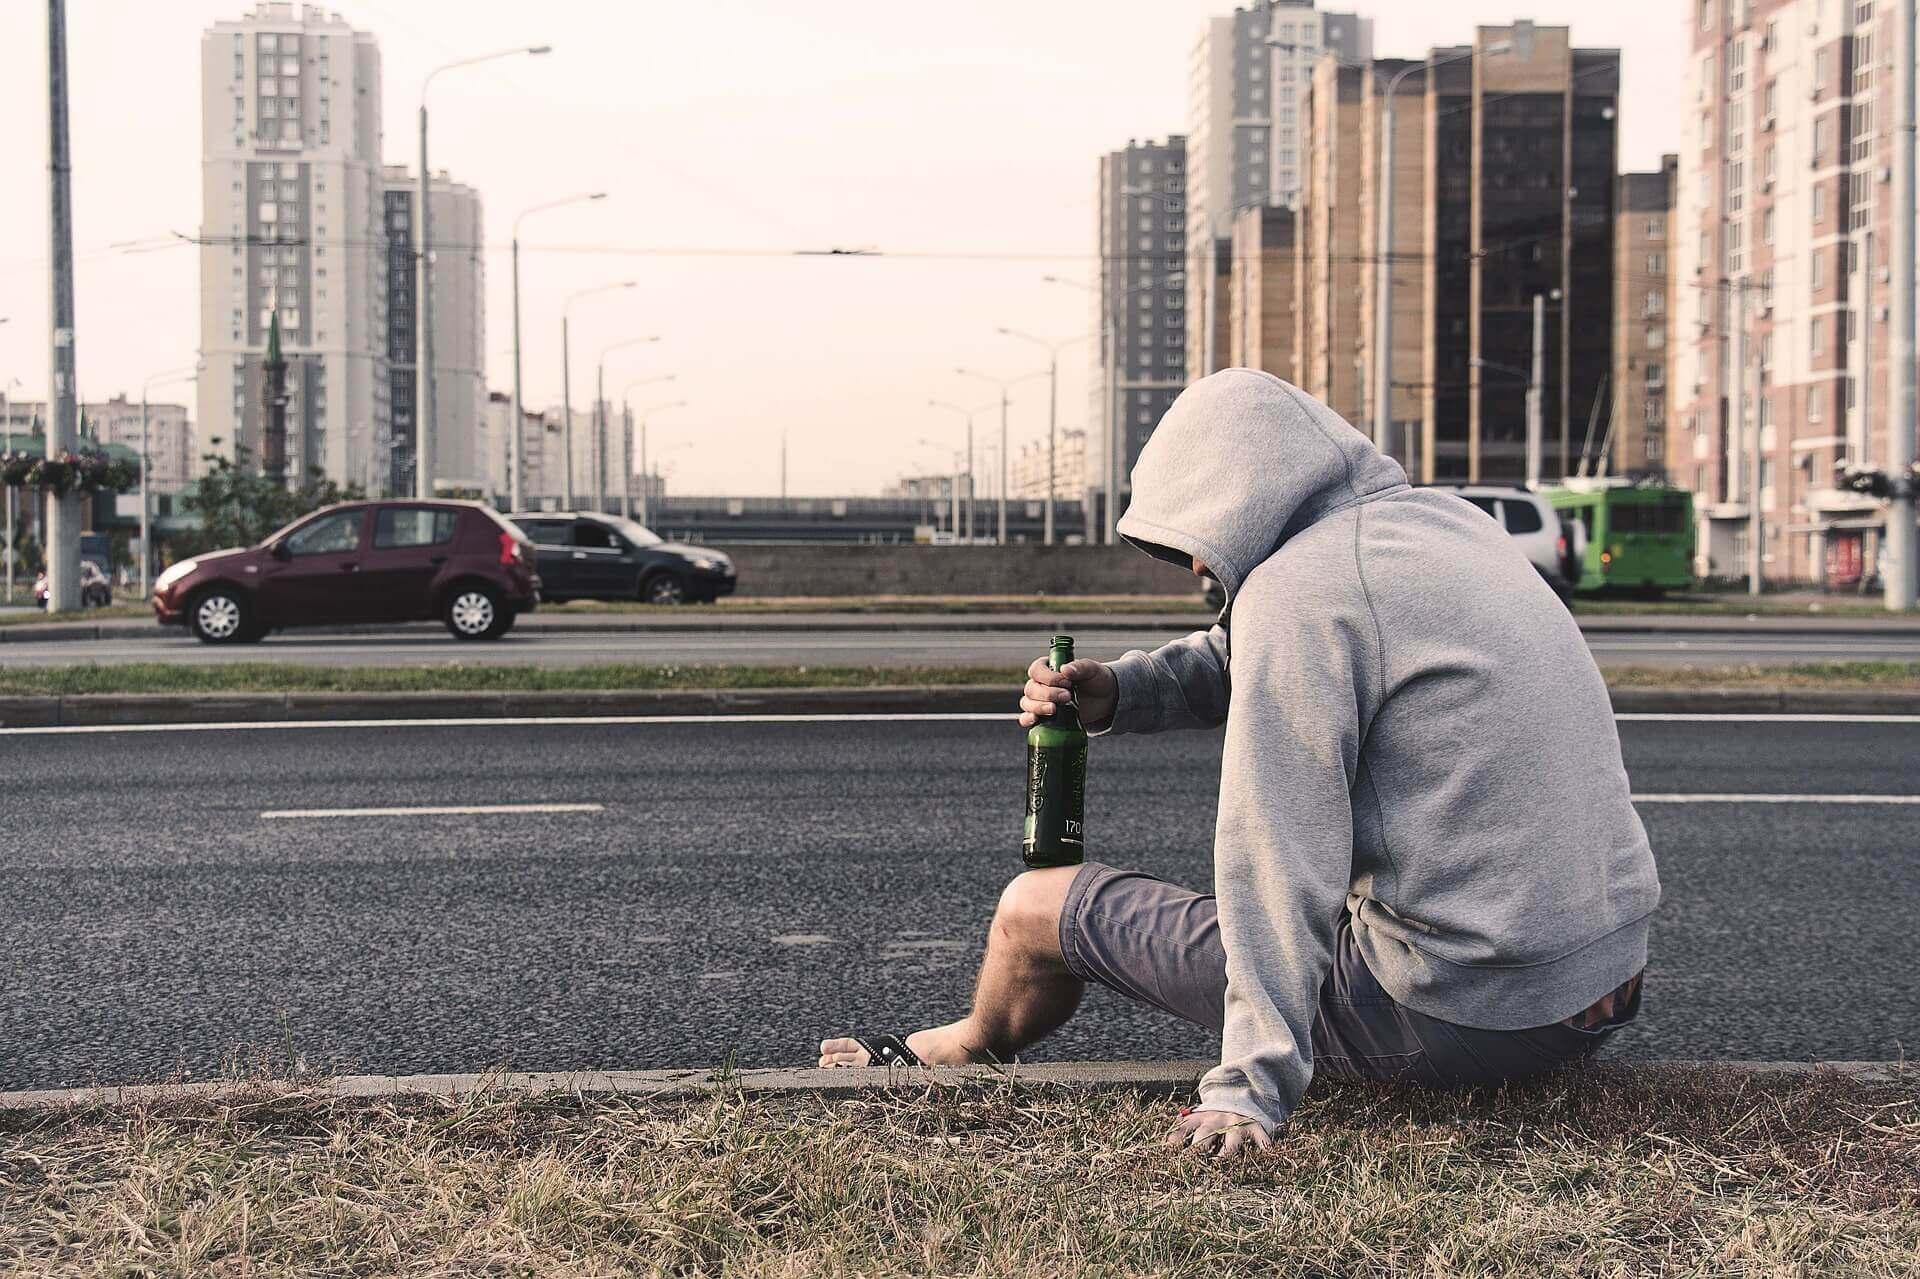 Overmatig alcoholgebruik kan leiden tot angstgevoelens